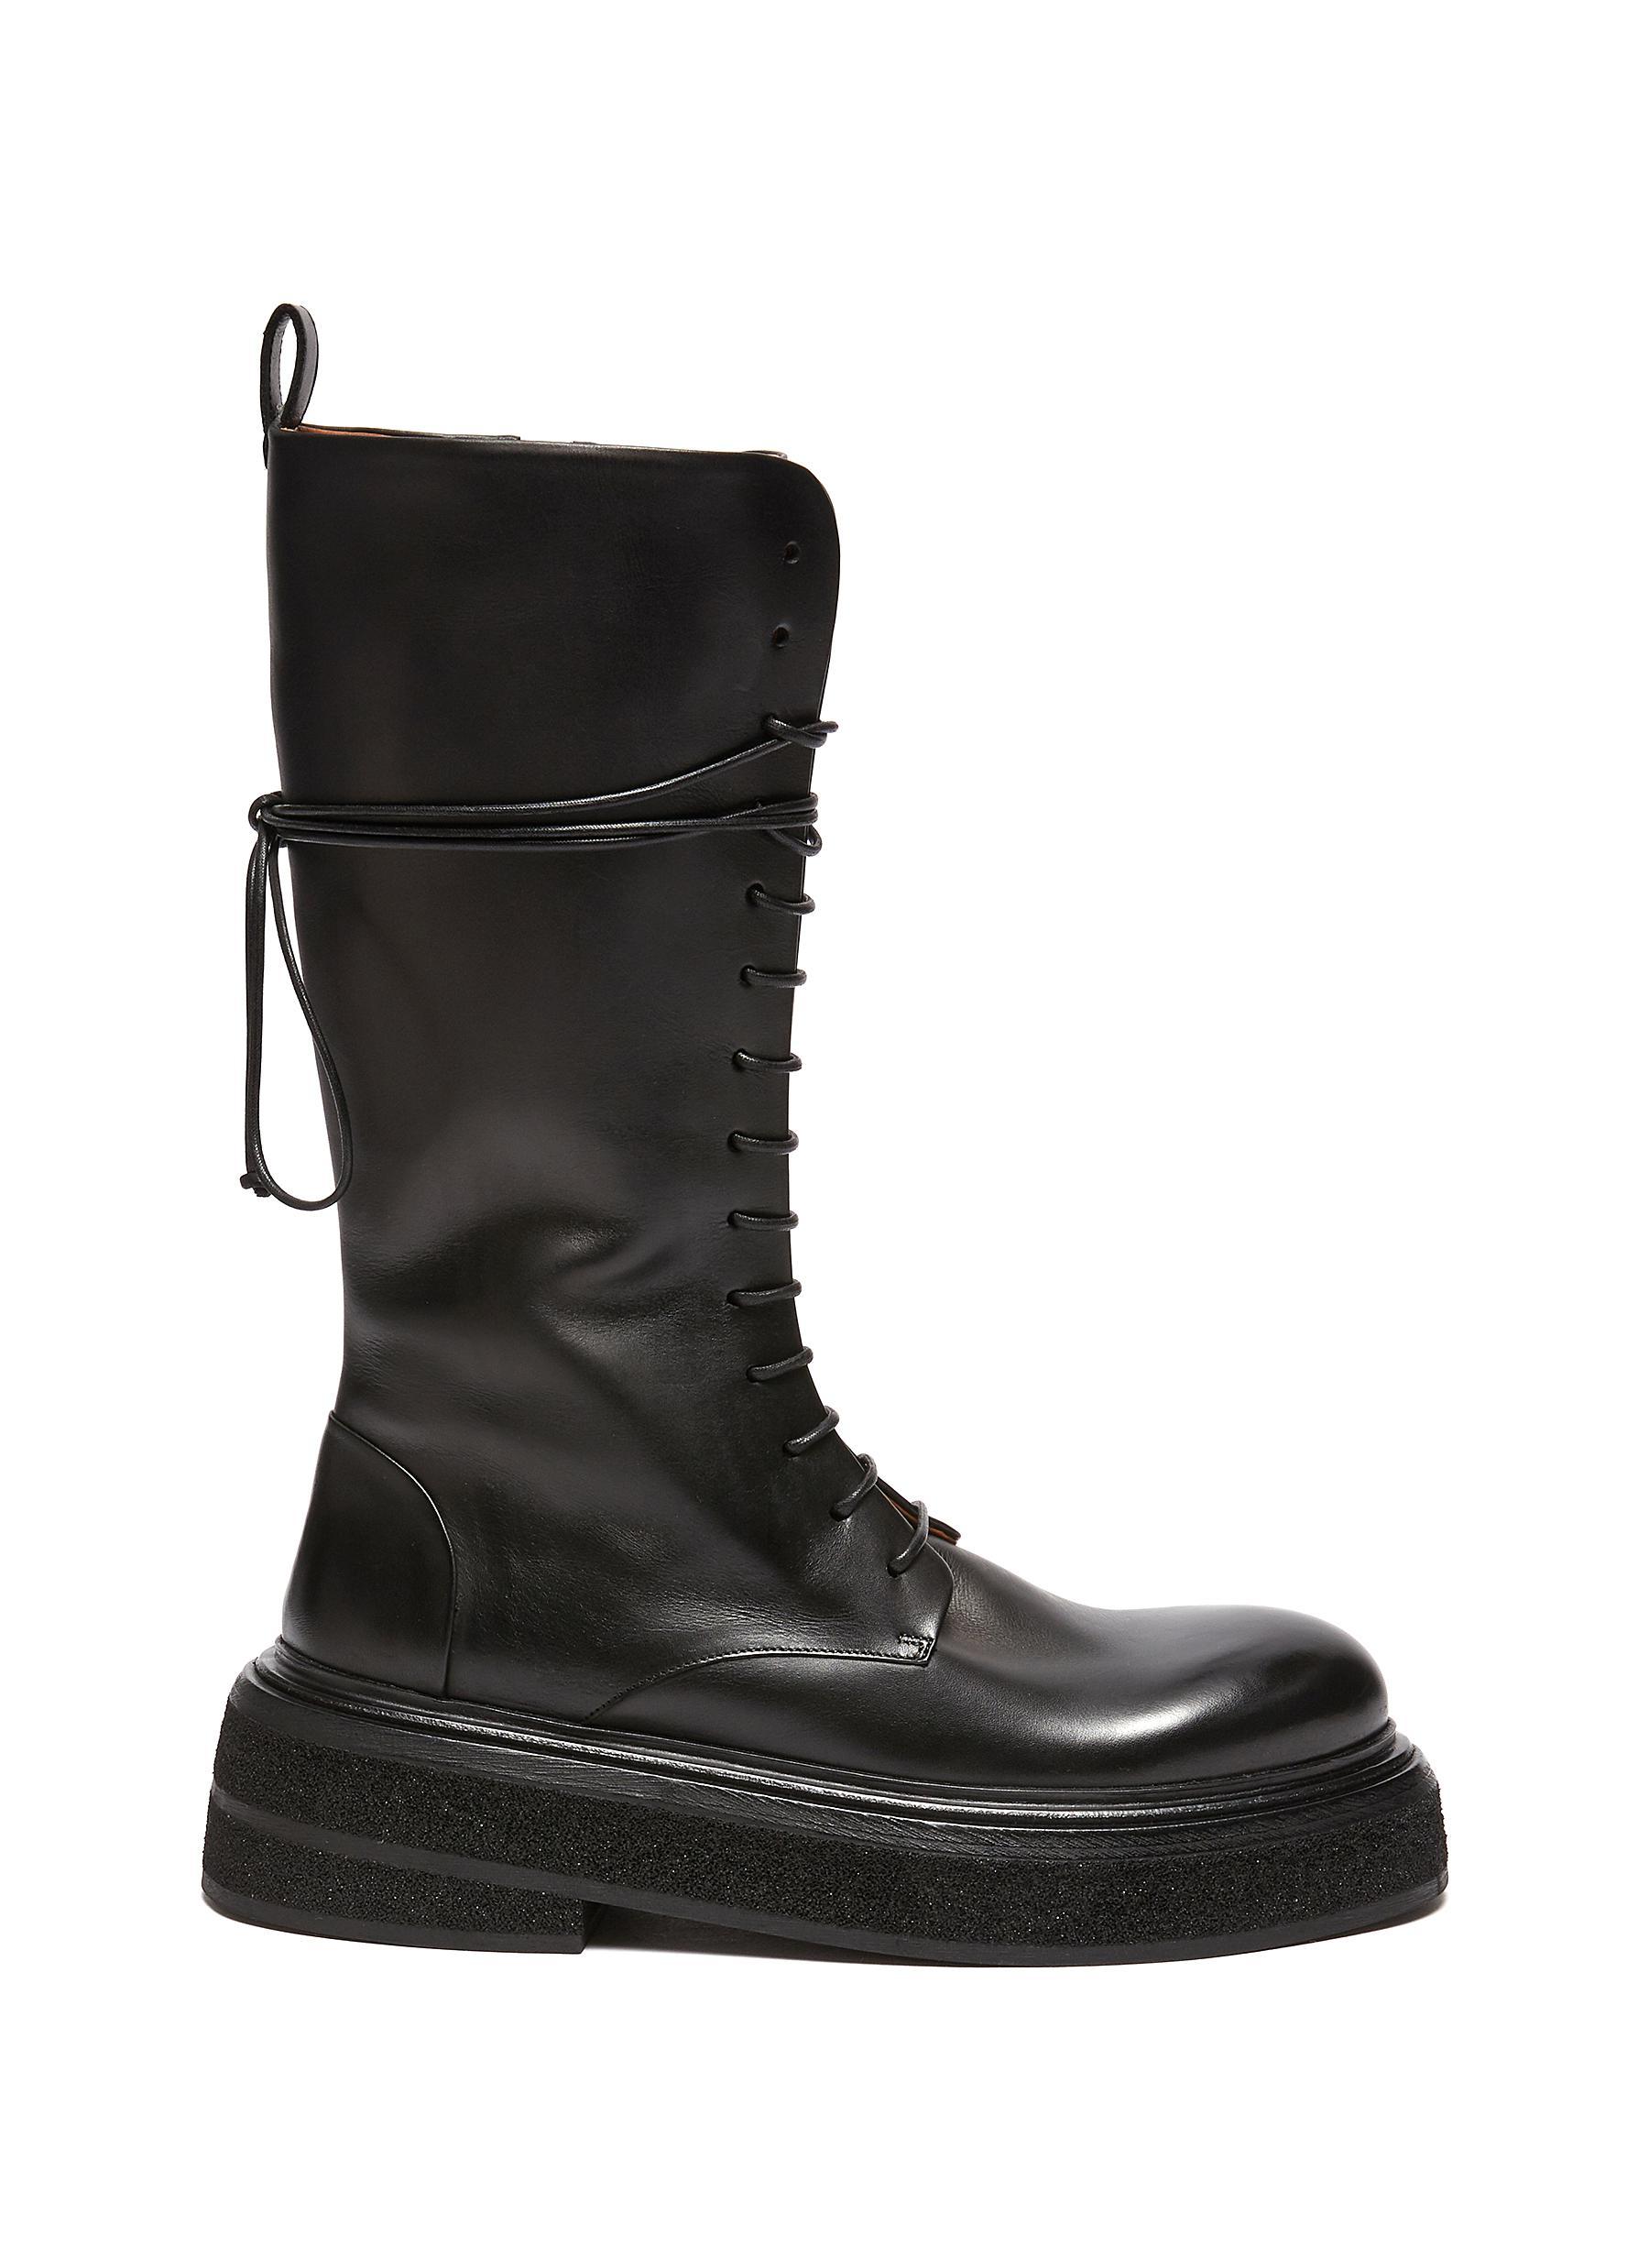 Zuccone Lace Up Combat Boots - MARSÈLL - Modalova